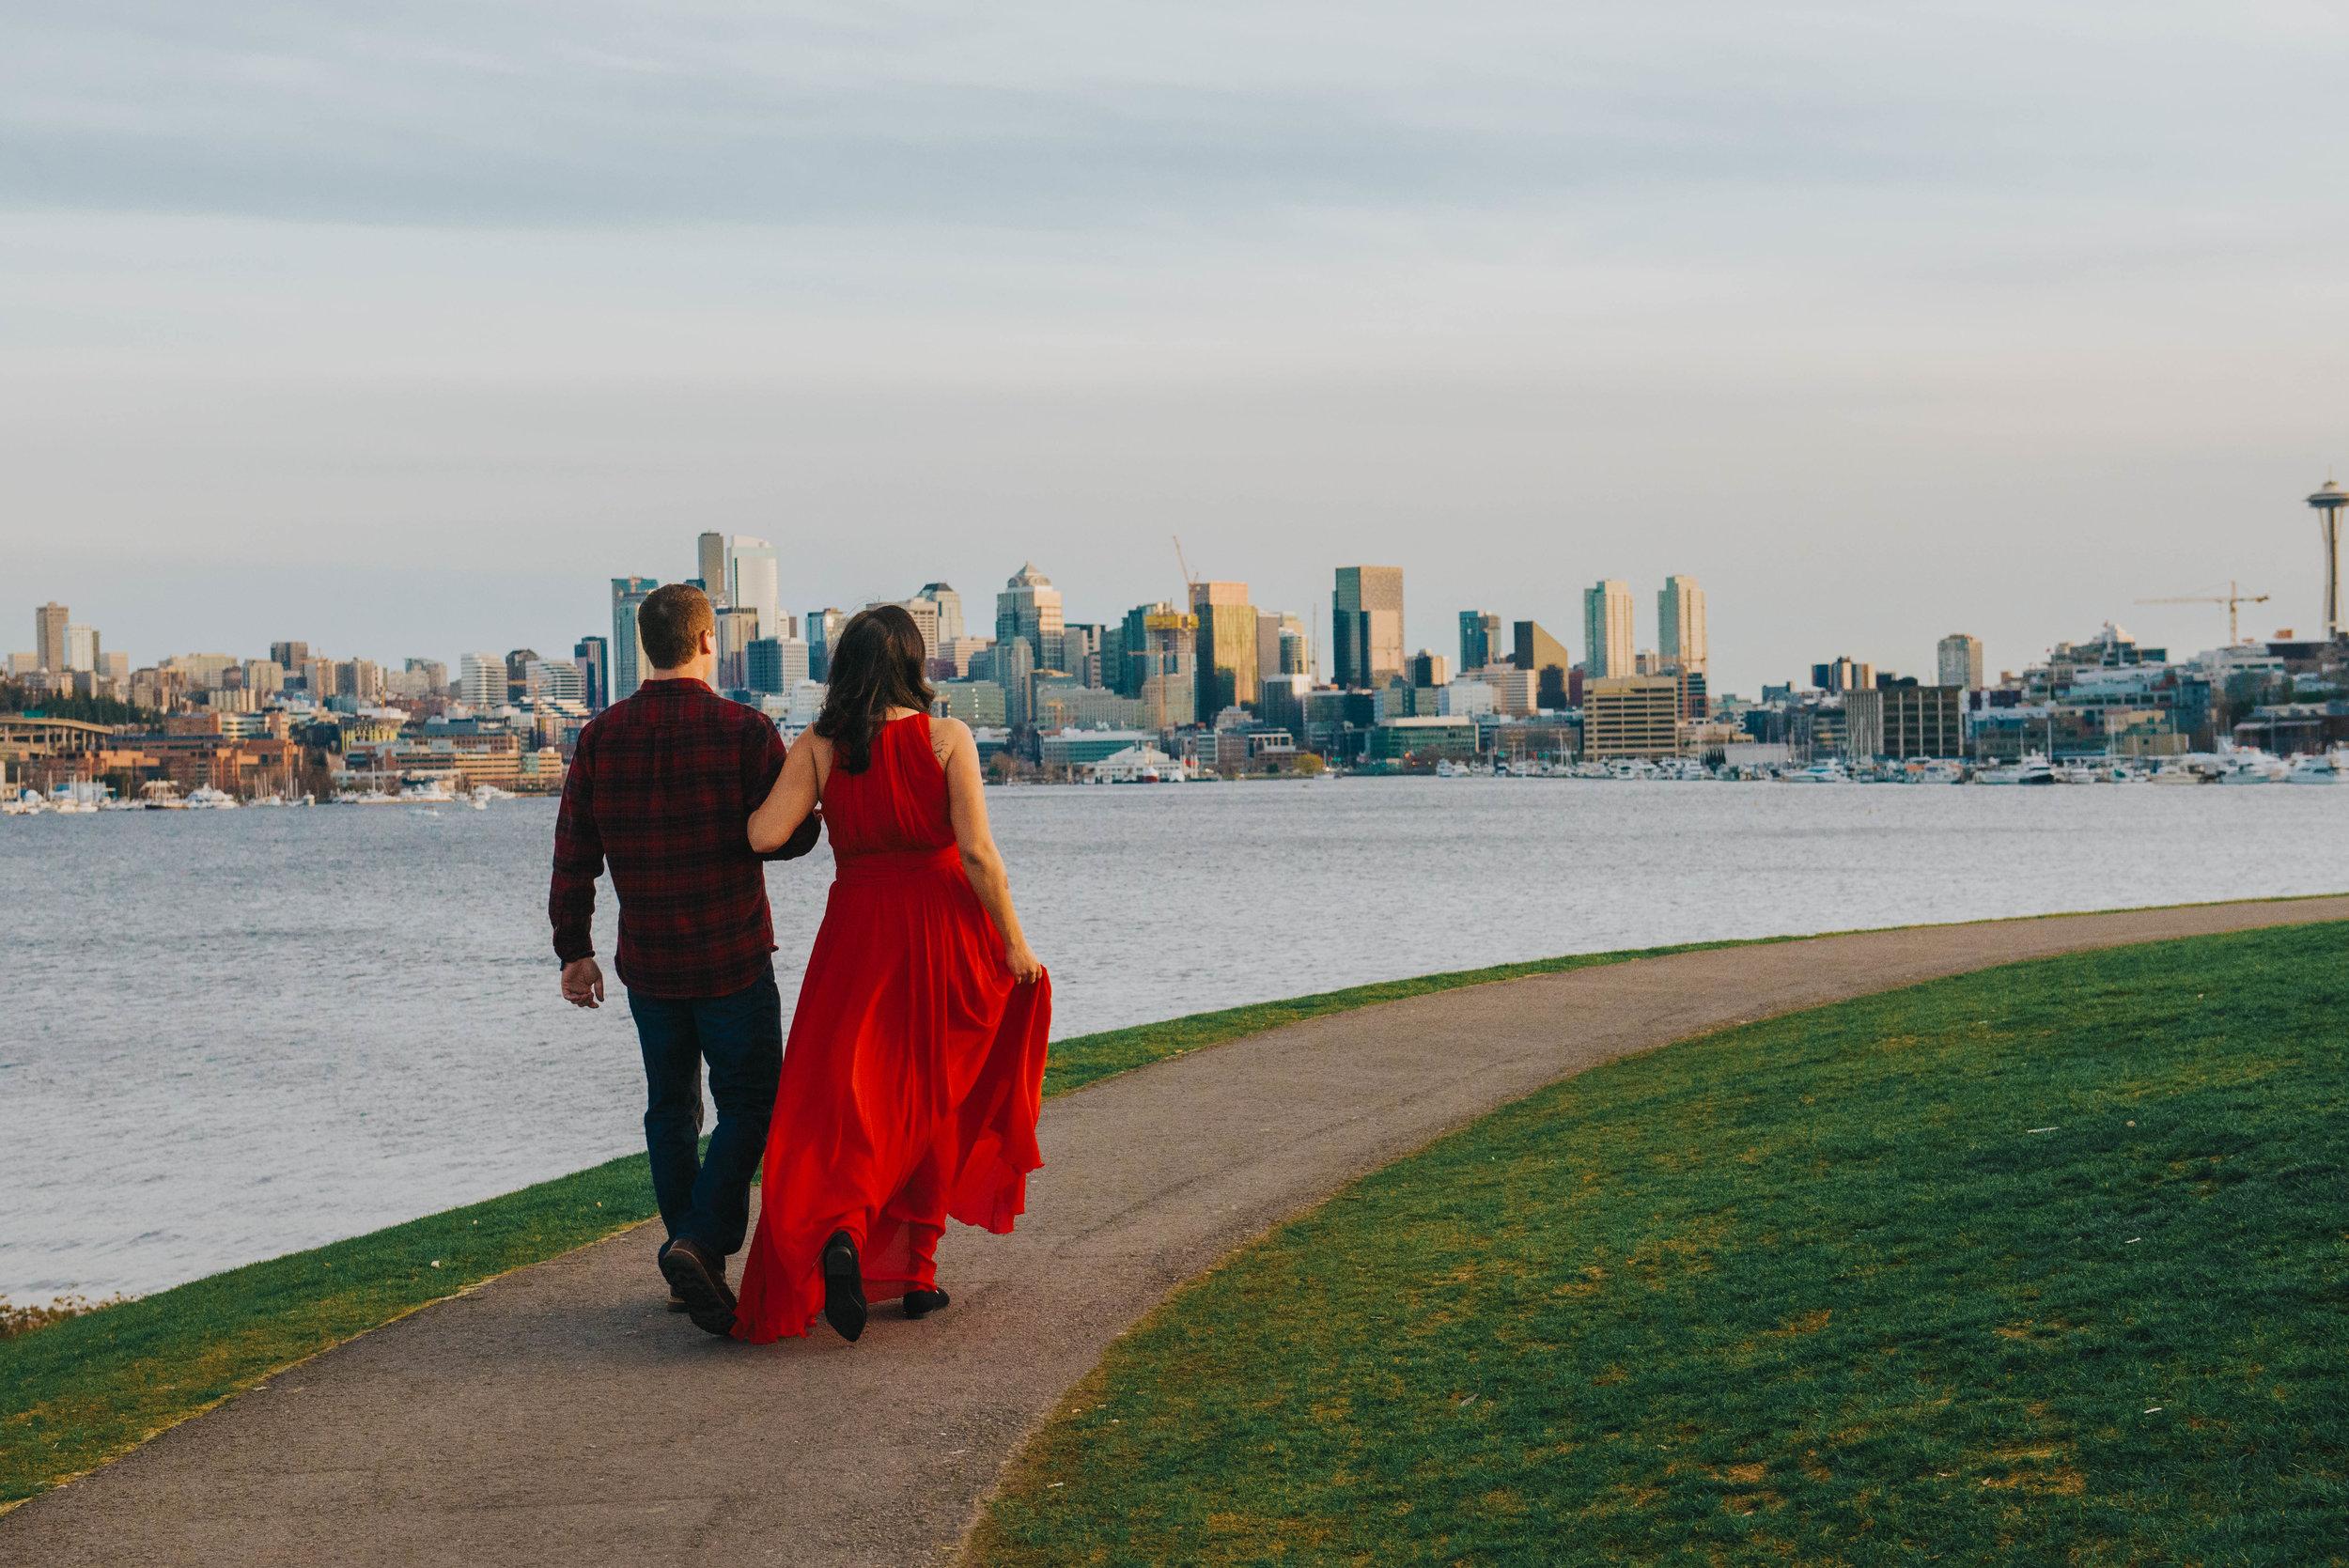 Oak-Harbor-Wedding-Photographer-J-Hodges (10 of 18).jpg